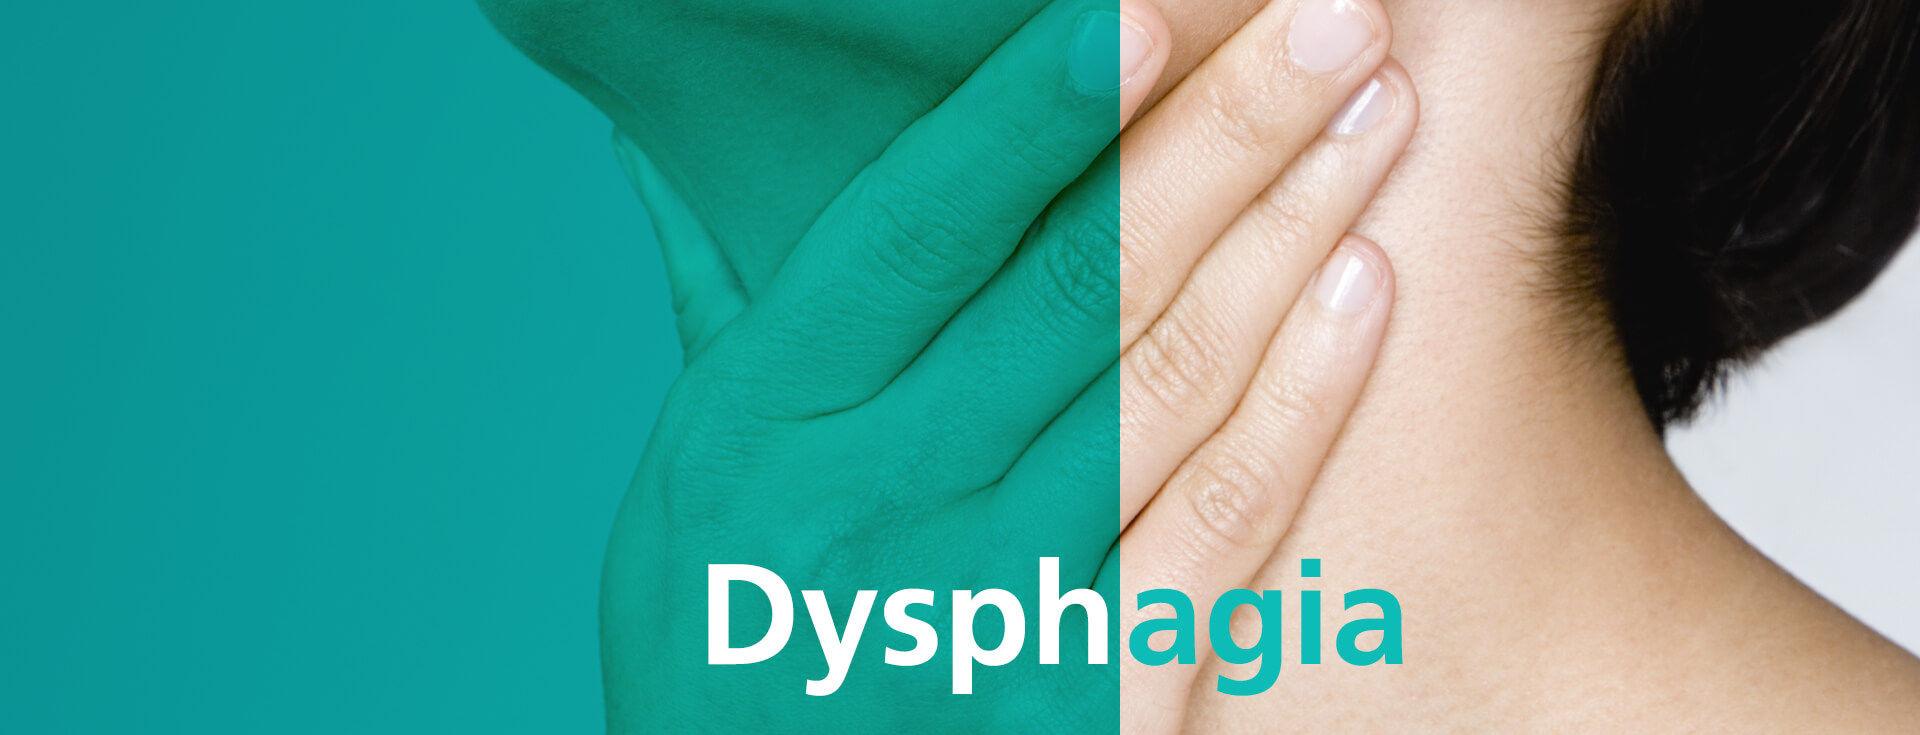 Dysphagia - causes & treatment